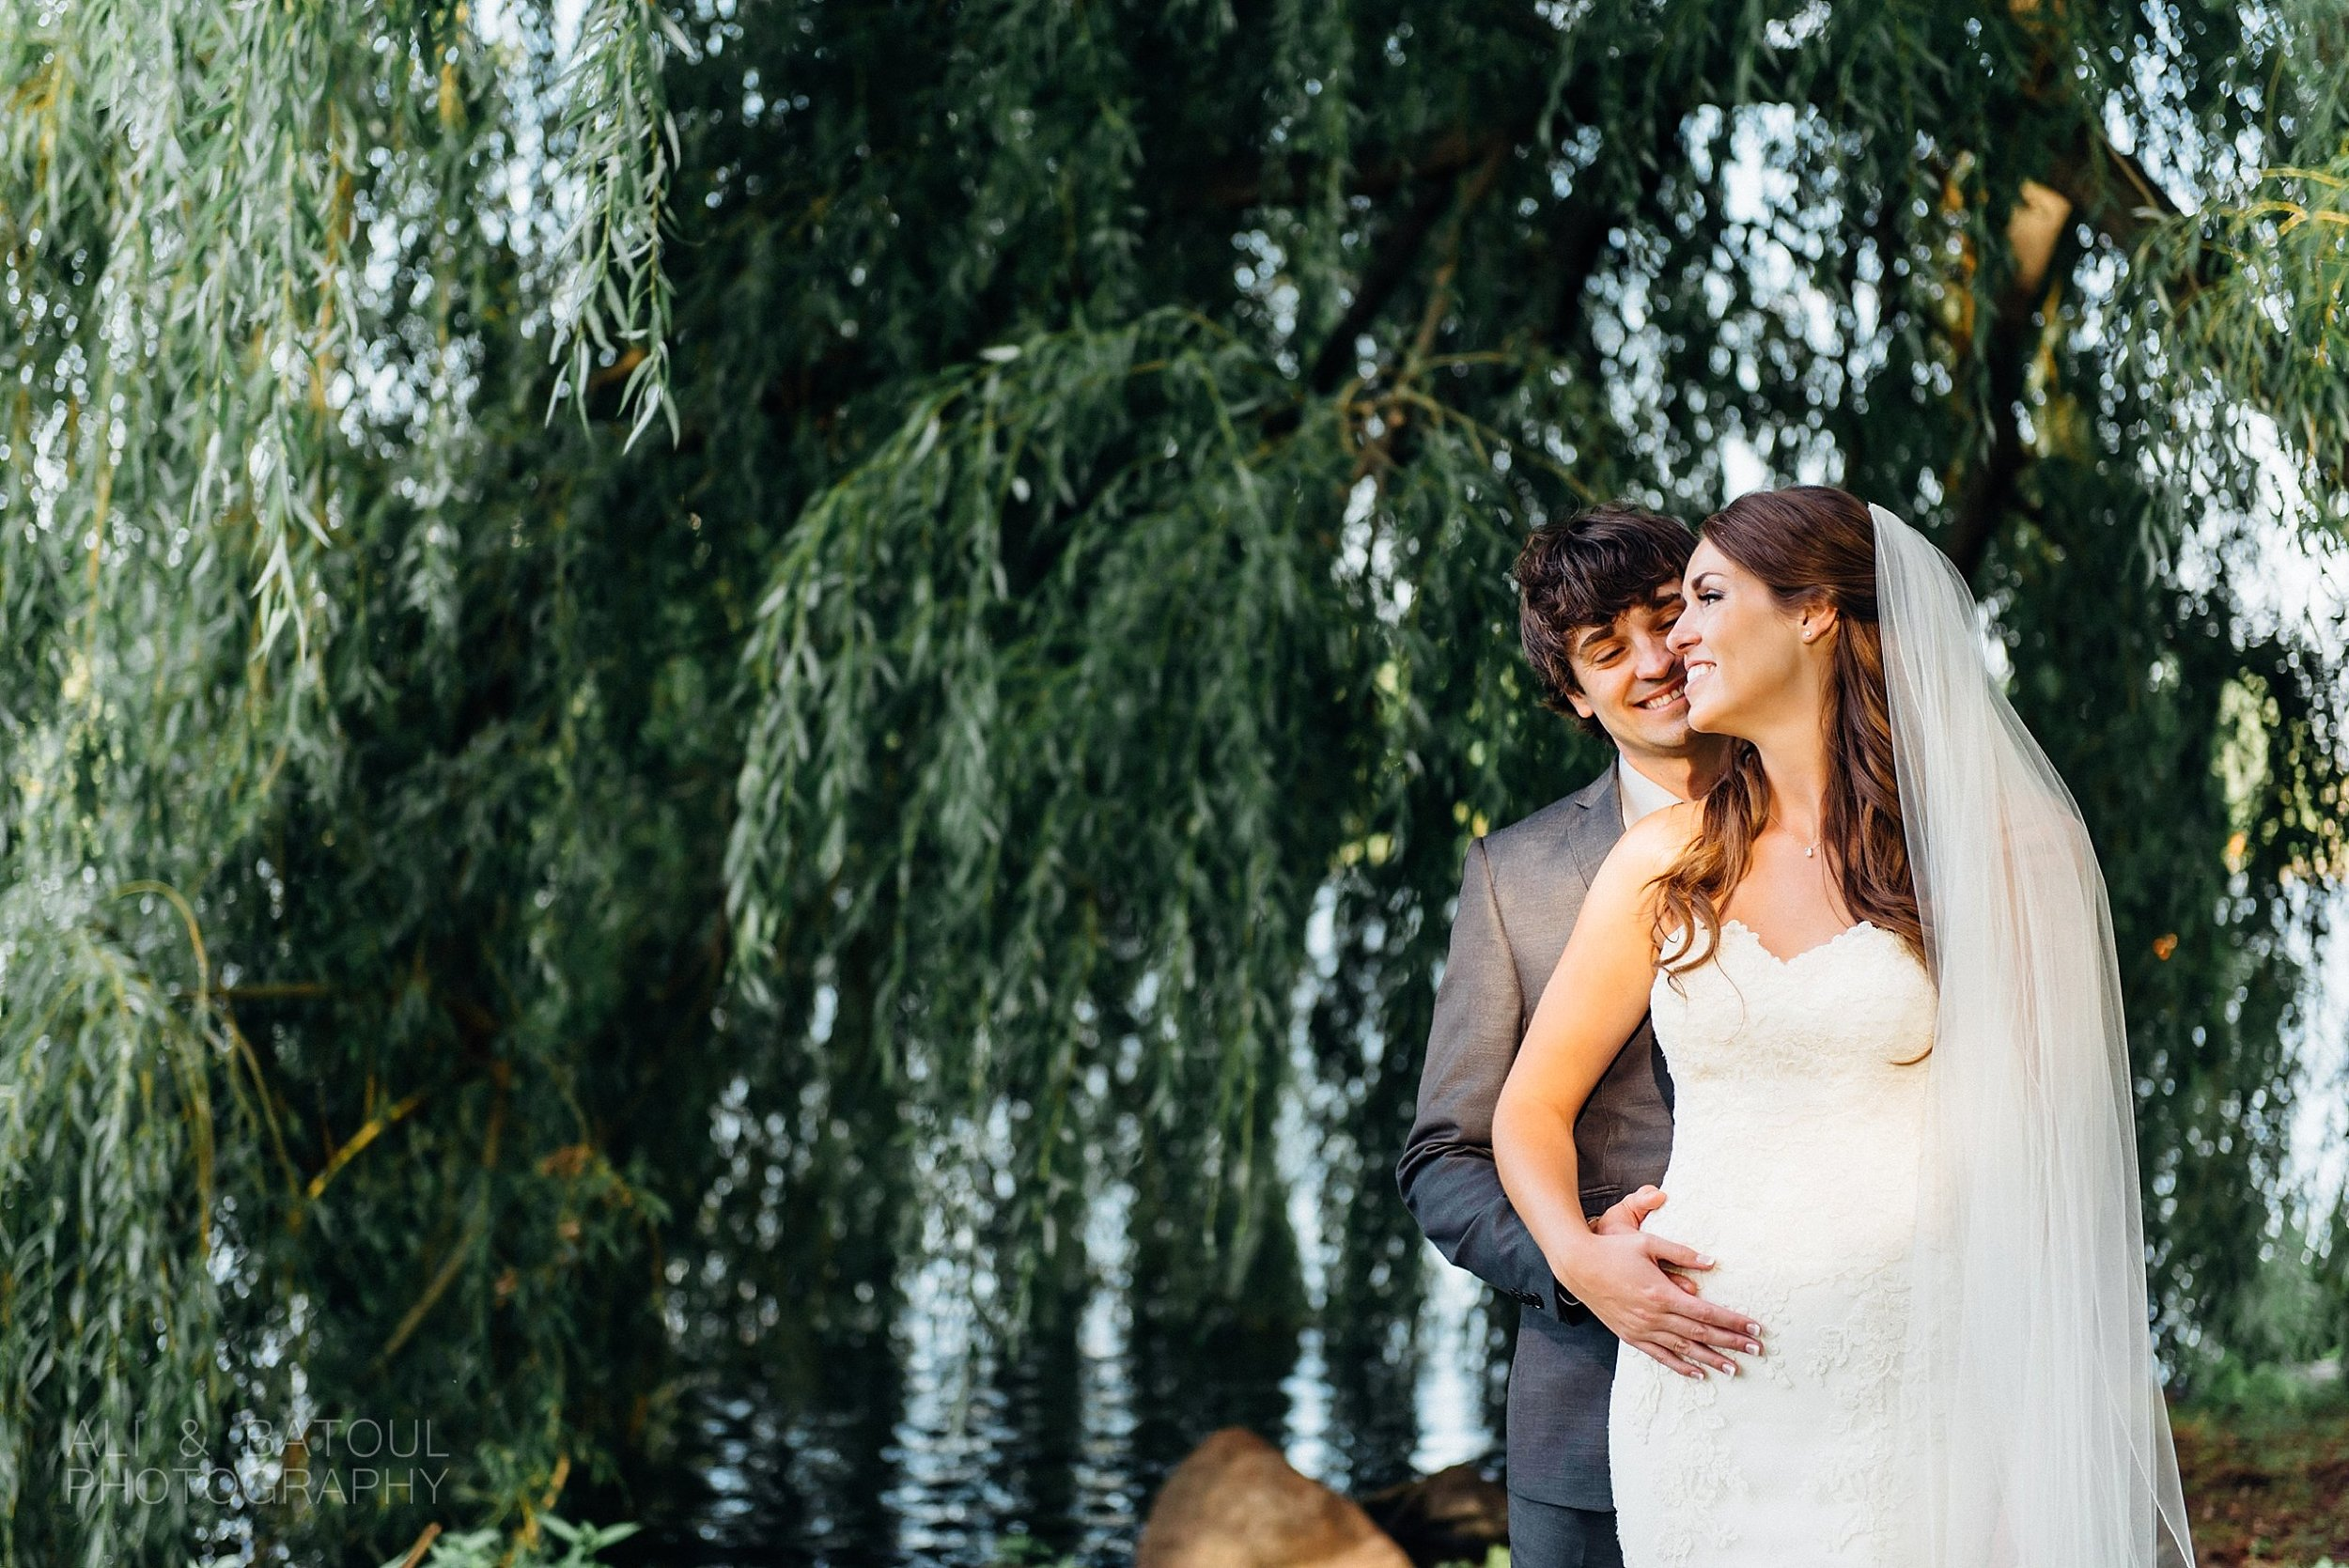 Ali & Batoul Photography - Documentary Fine Art Ottawa Wedding Photography_0065.jpg